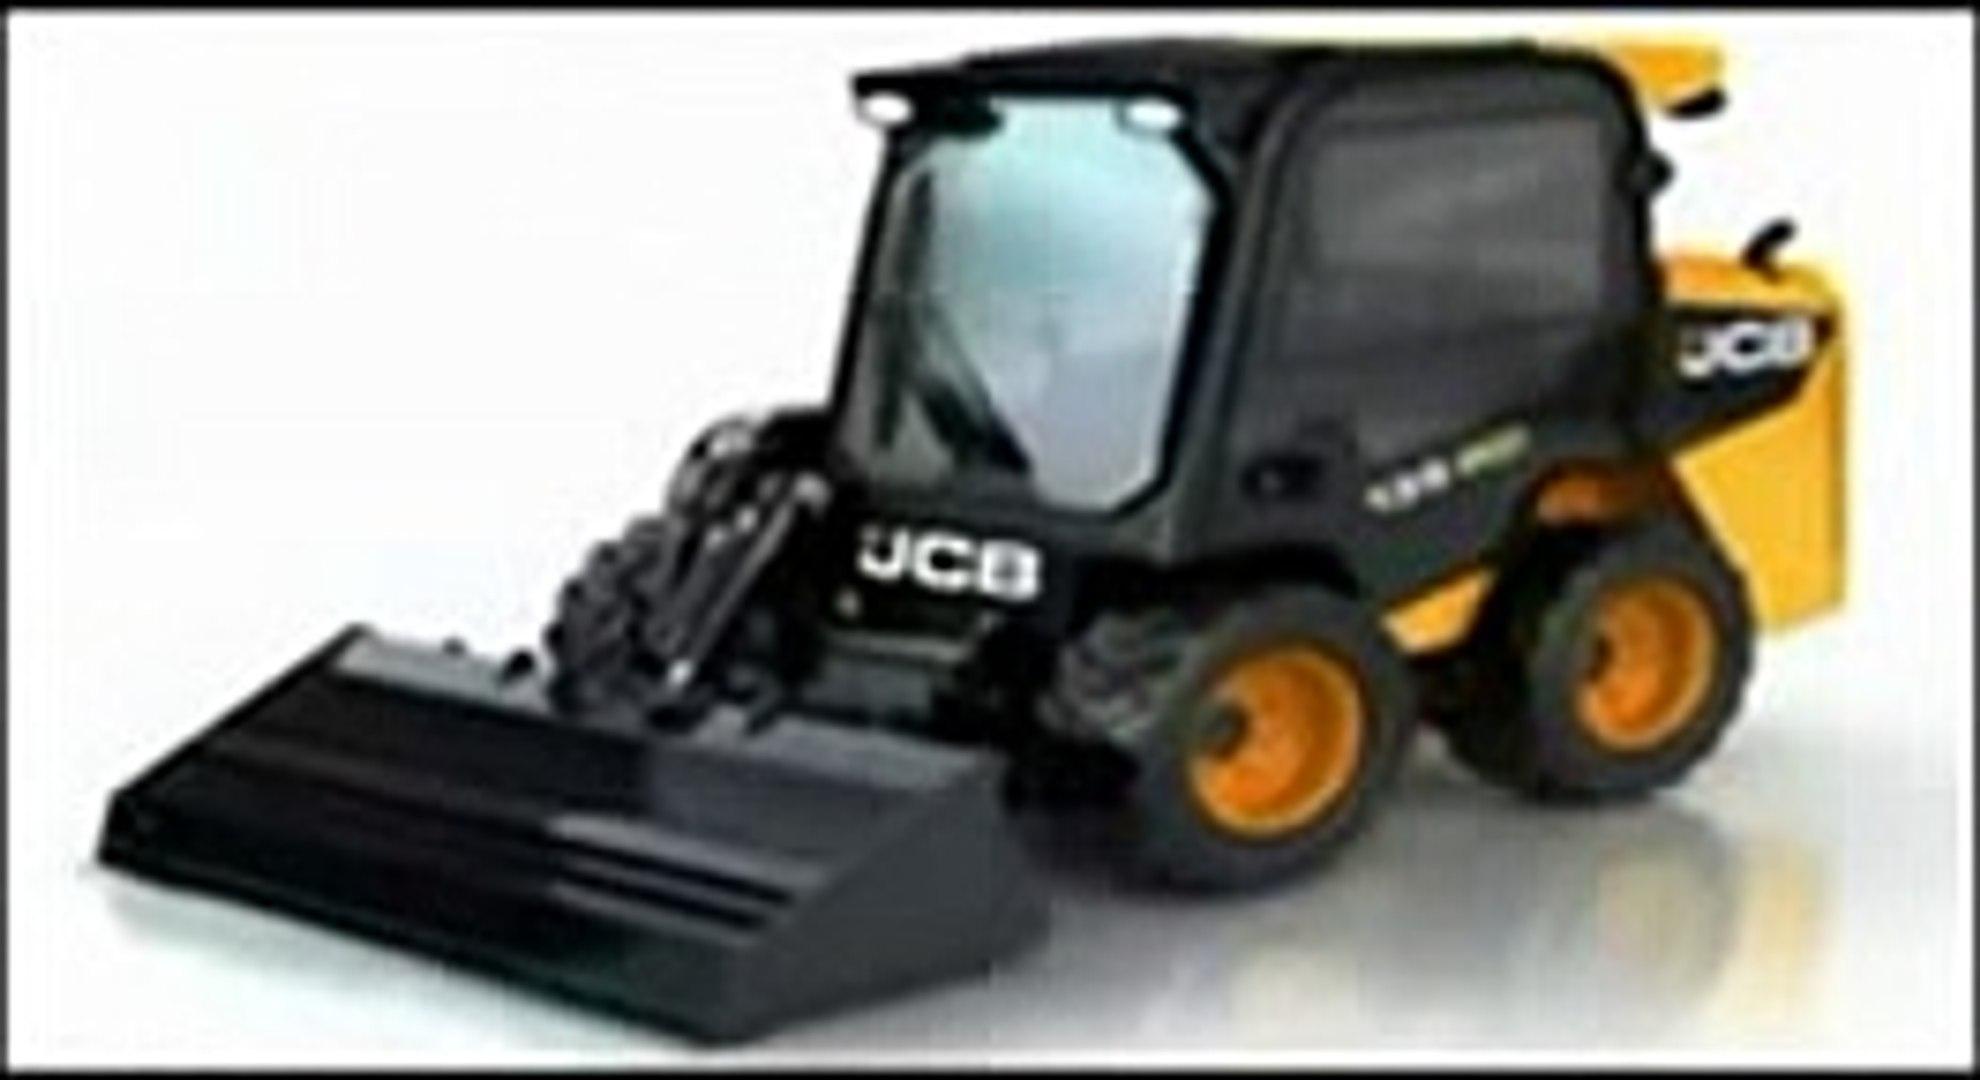 JCB 135, 155, 175, 190, 205, 150T, 190T, 205T Skid Steer Loader (ROBOT)  Service Repair Manual INSTANT DOWNLOAD